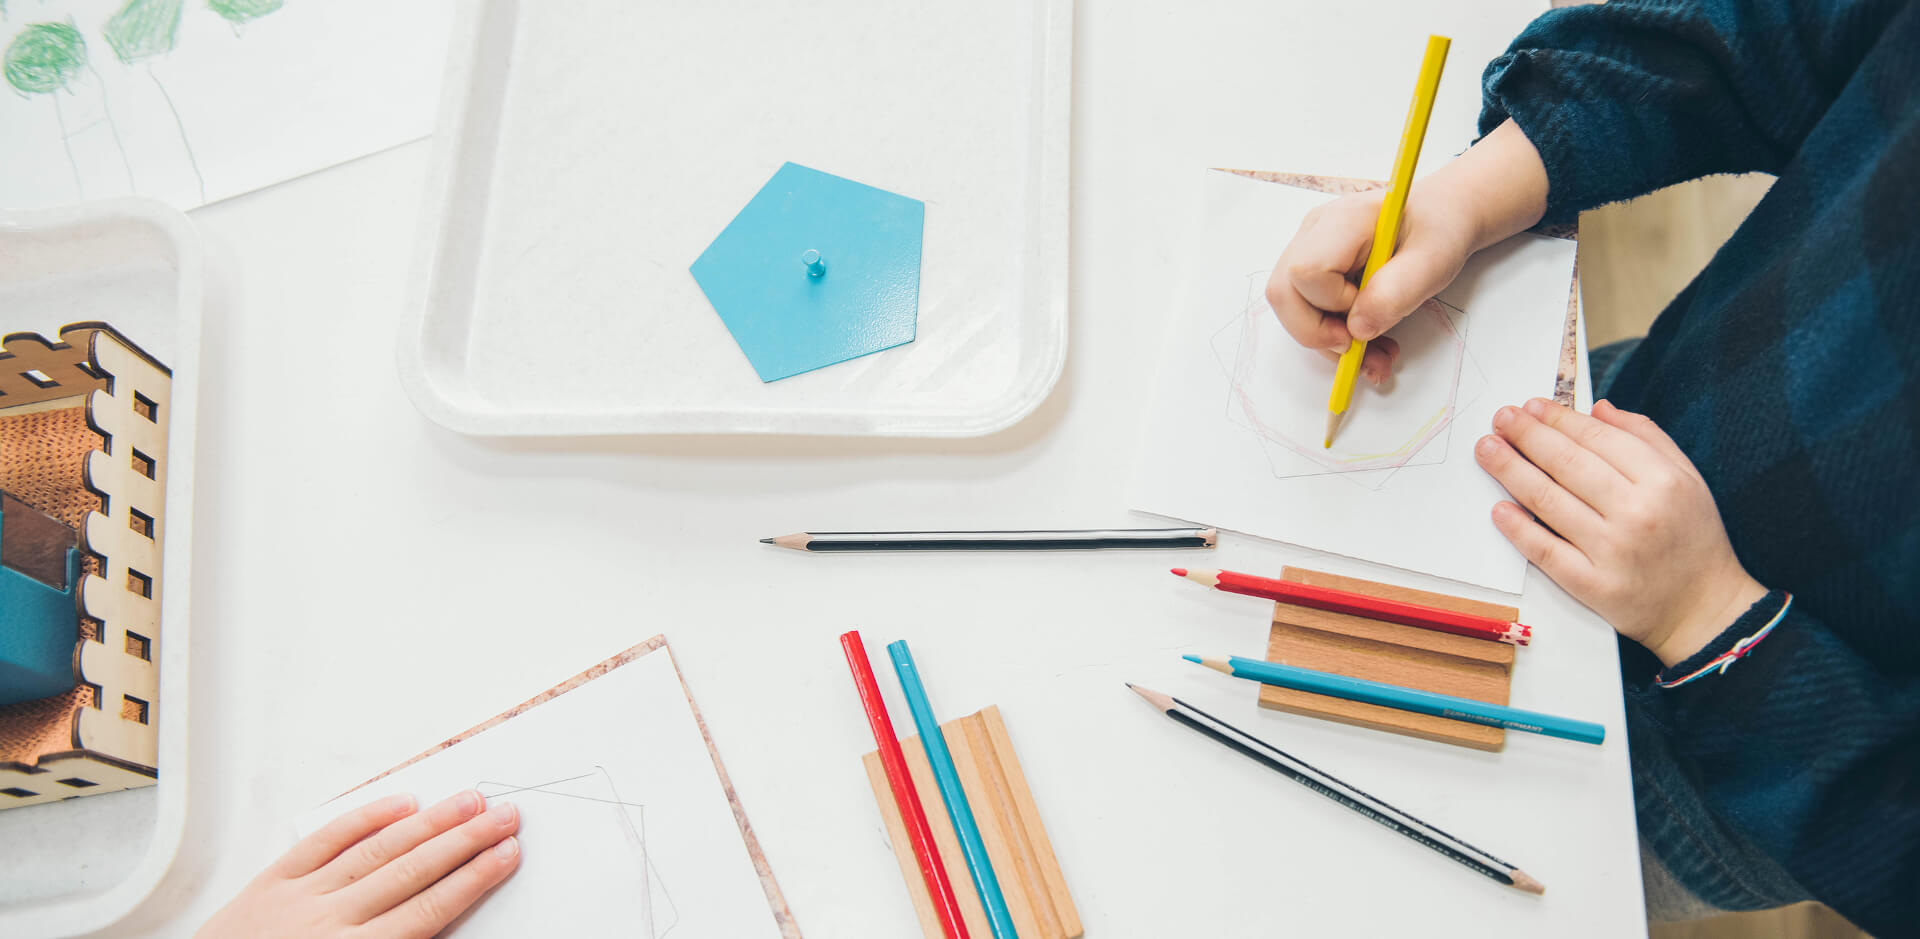 Creazione di materiale didattico per Internet